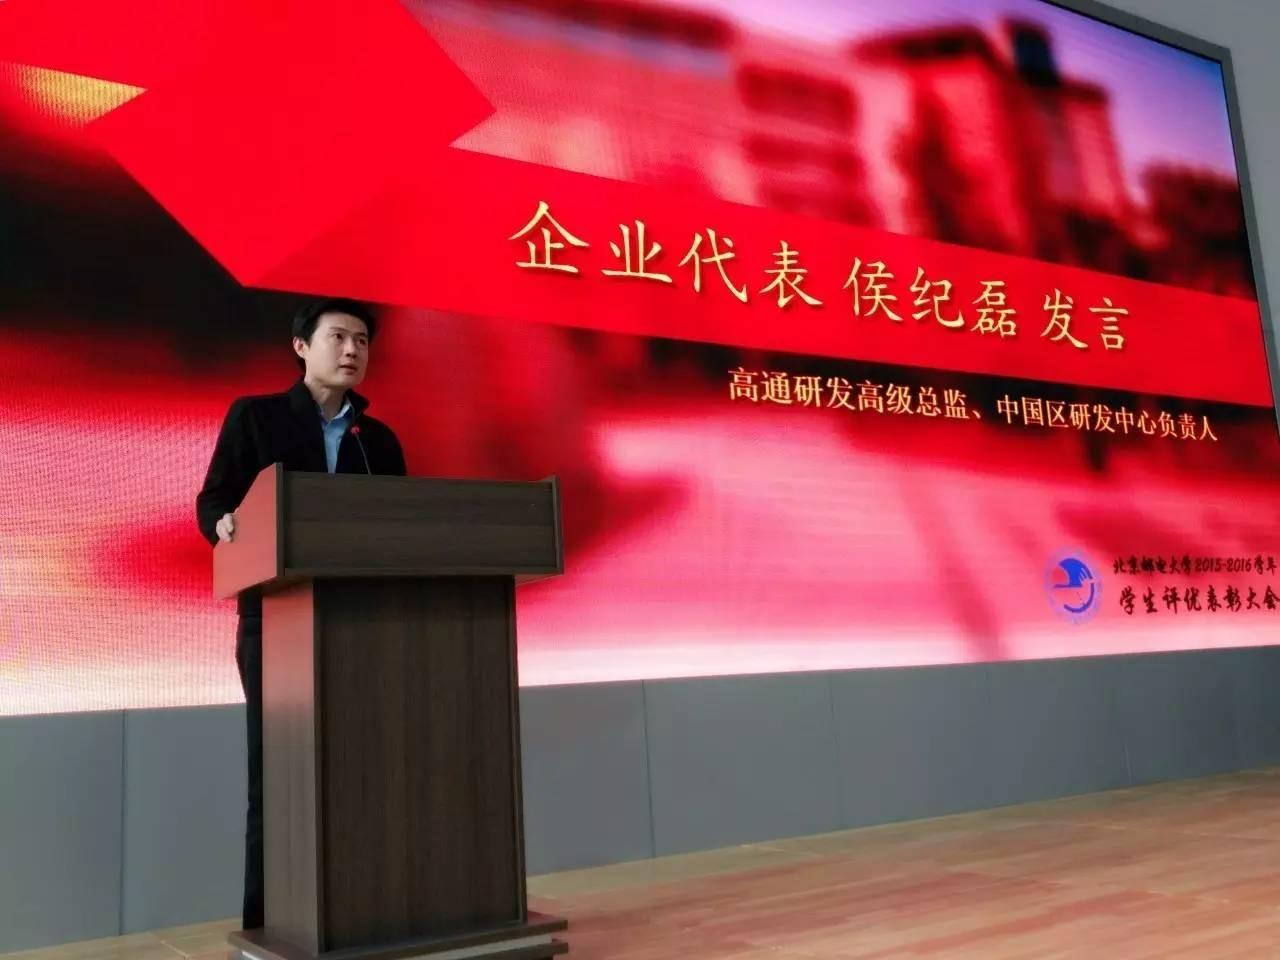 Qualcomm 研发高级总监、中国区研发中心负责人侯纪磊博士